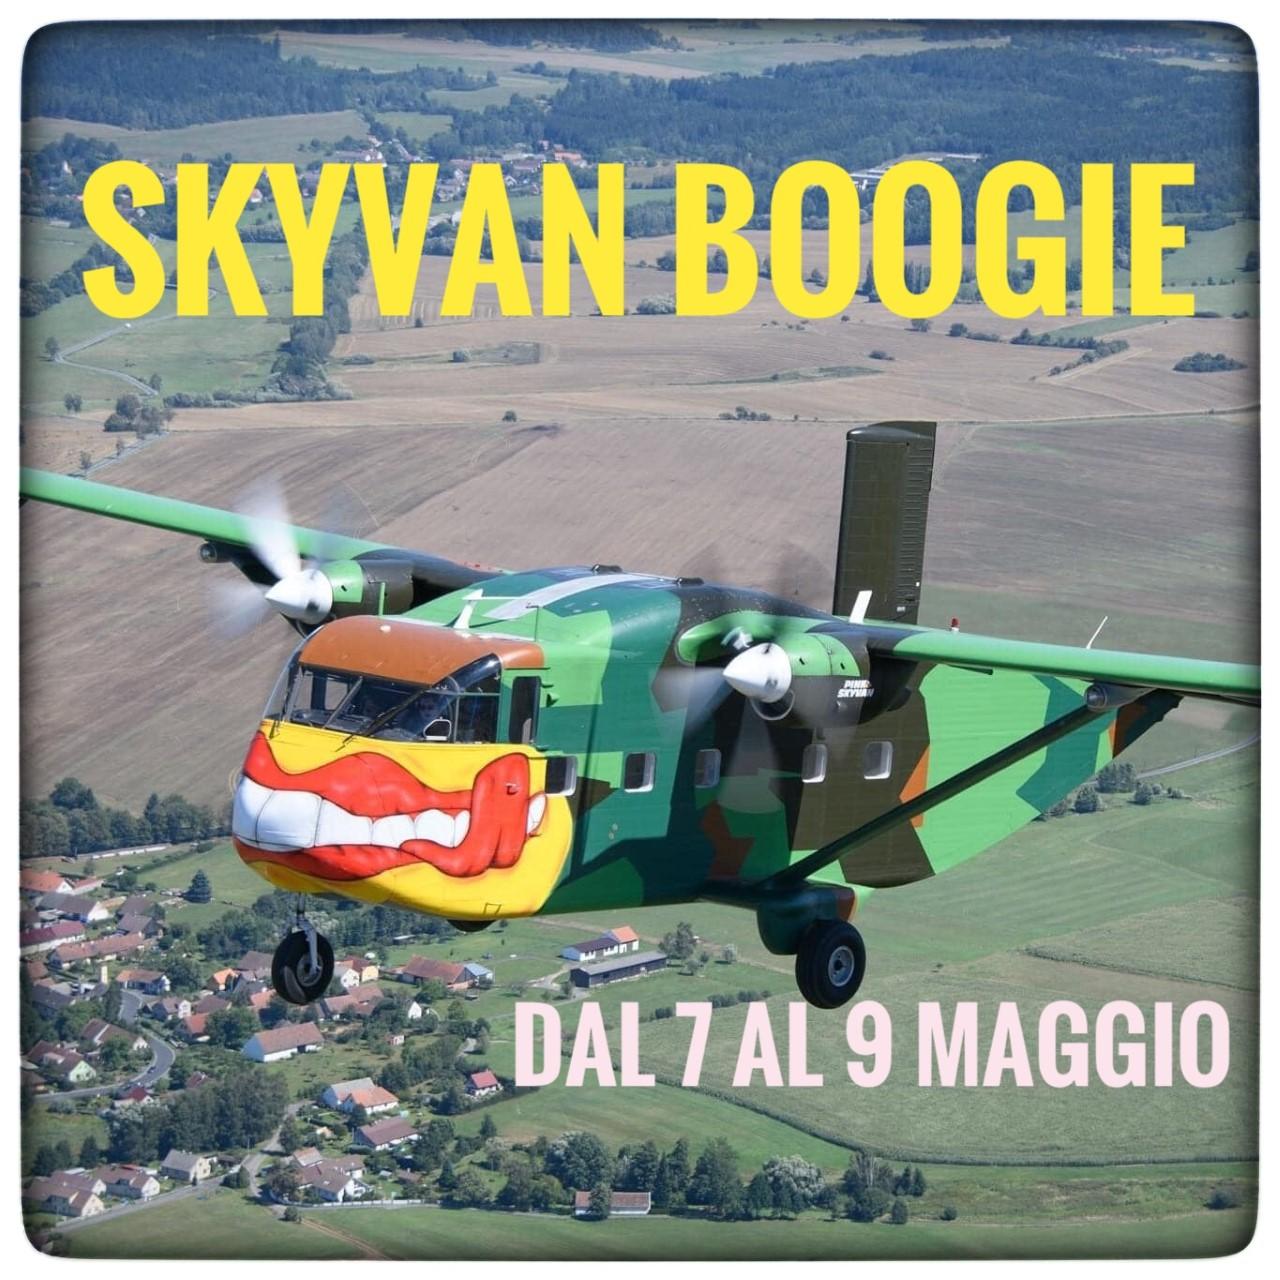 SKYVAN - BOOGIE